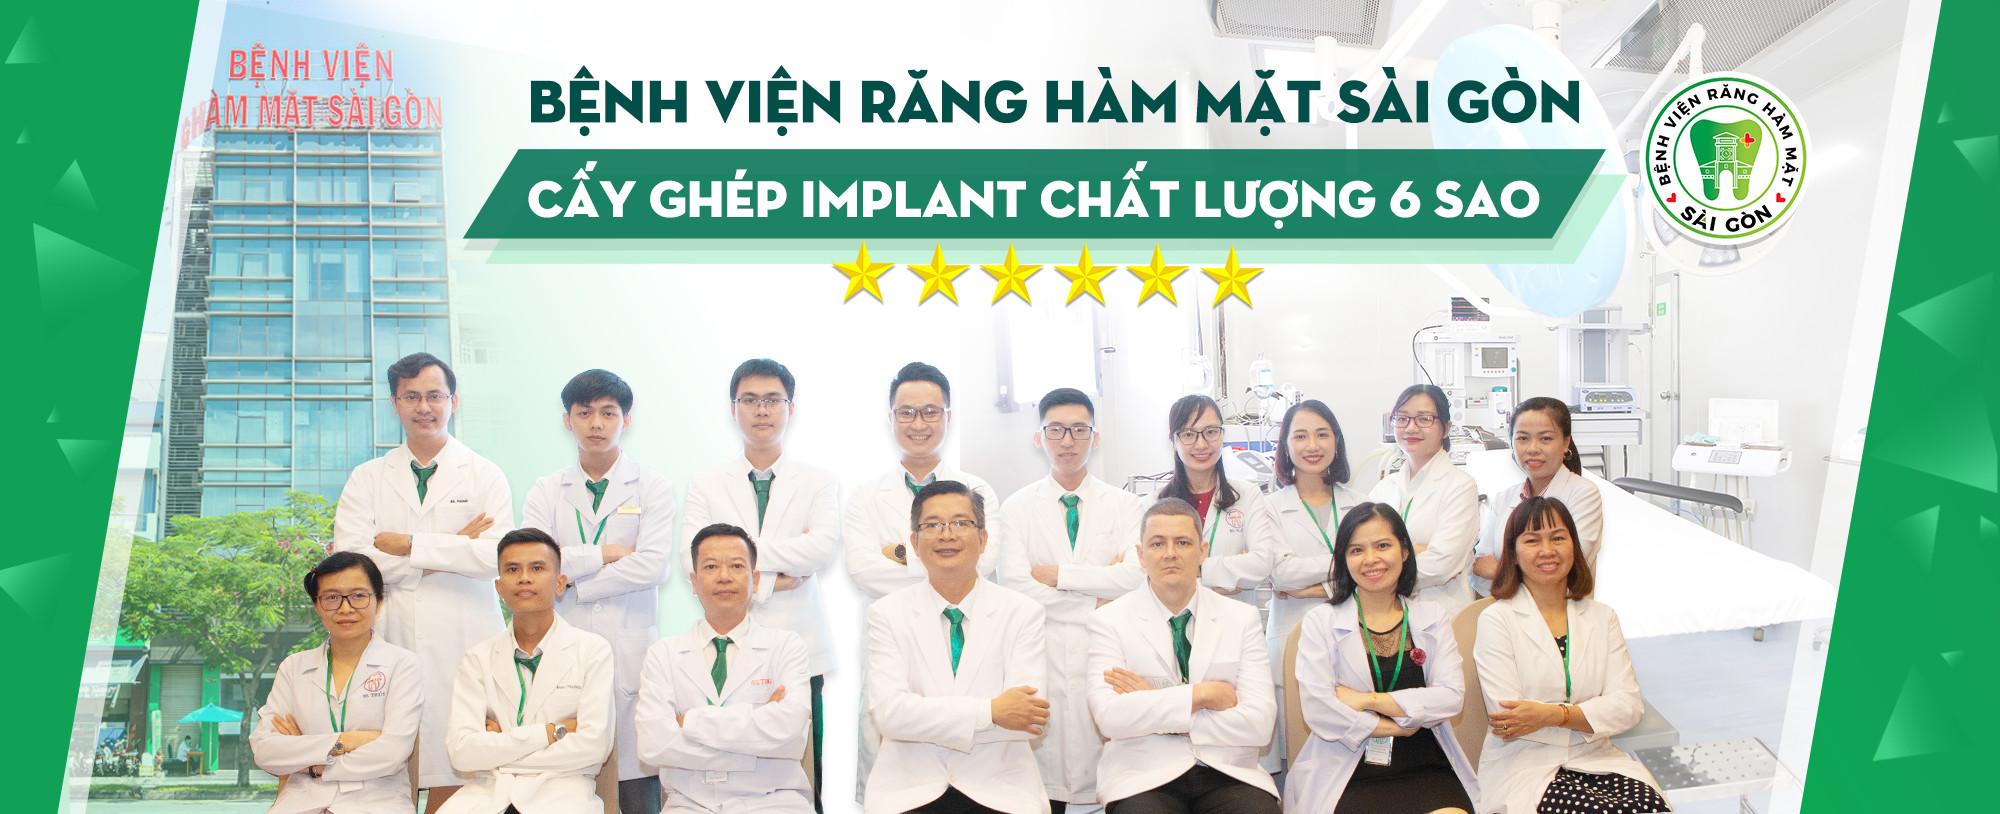 Cấy ghép implant 6 Sao